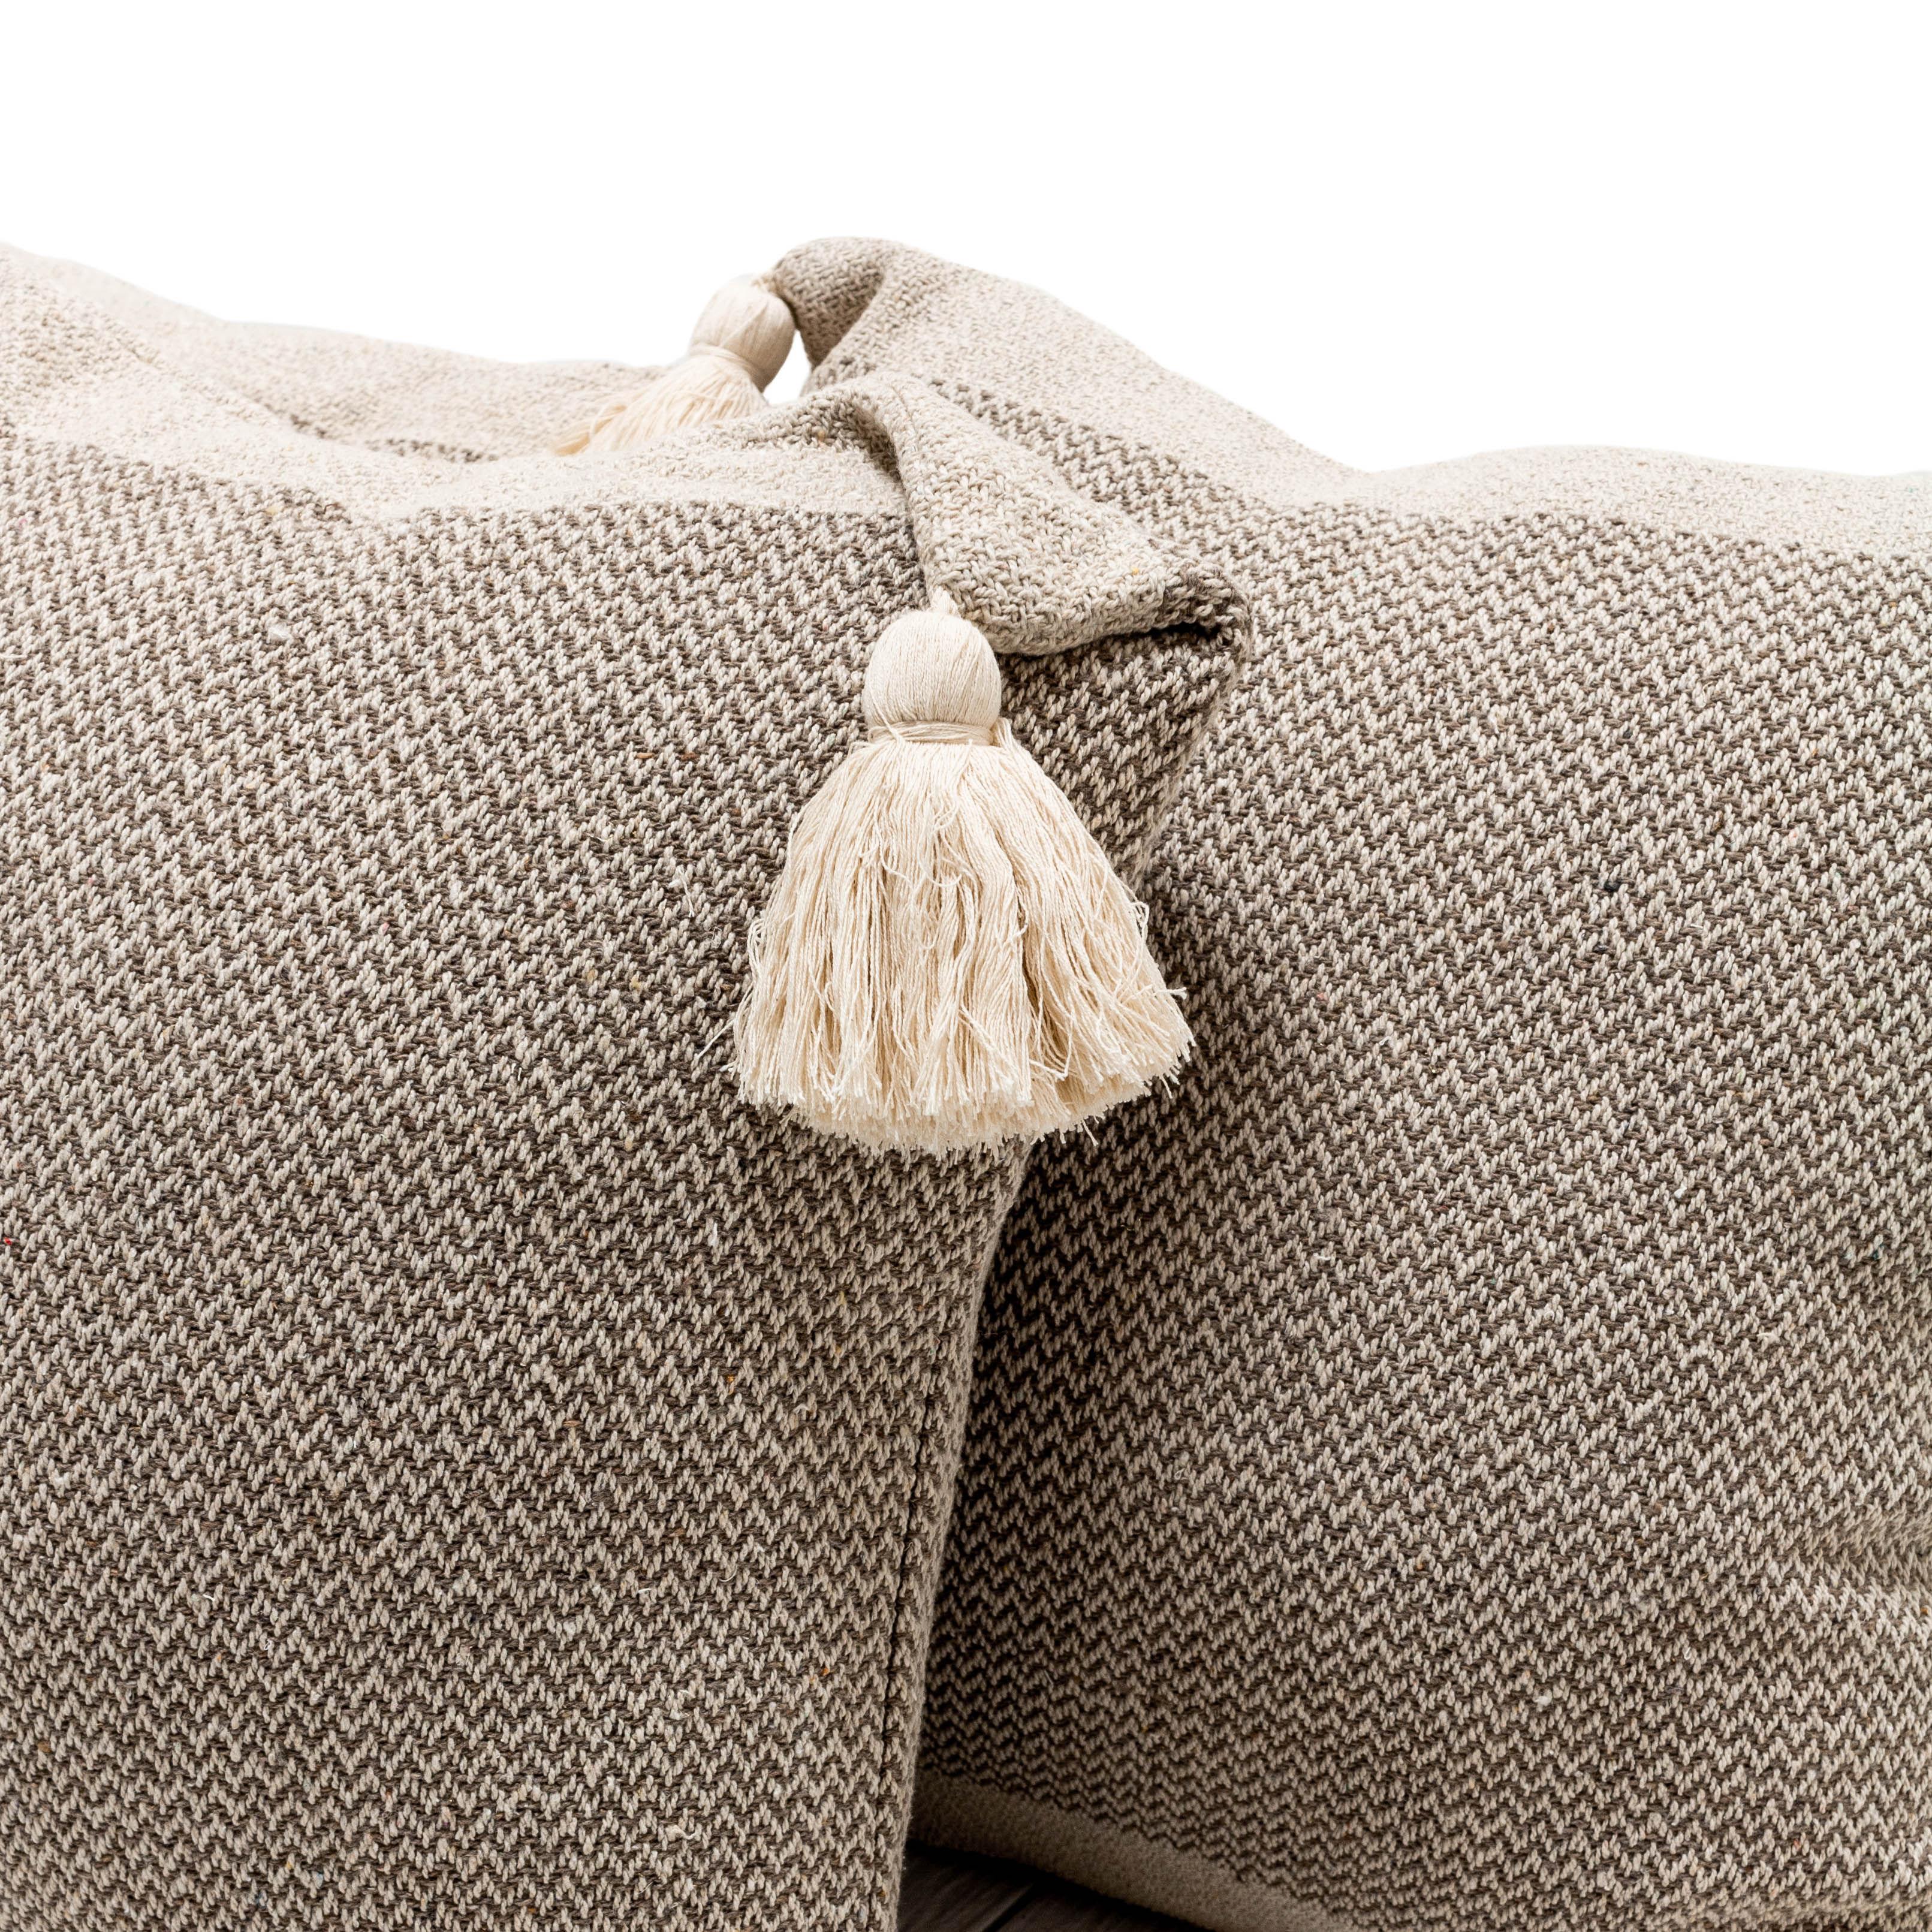 Brown Tassel Pillows